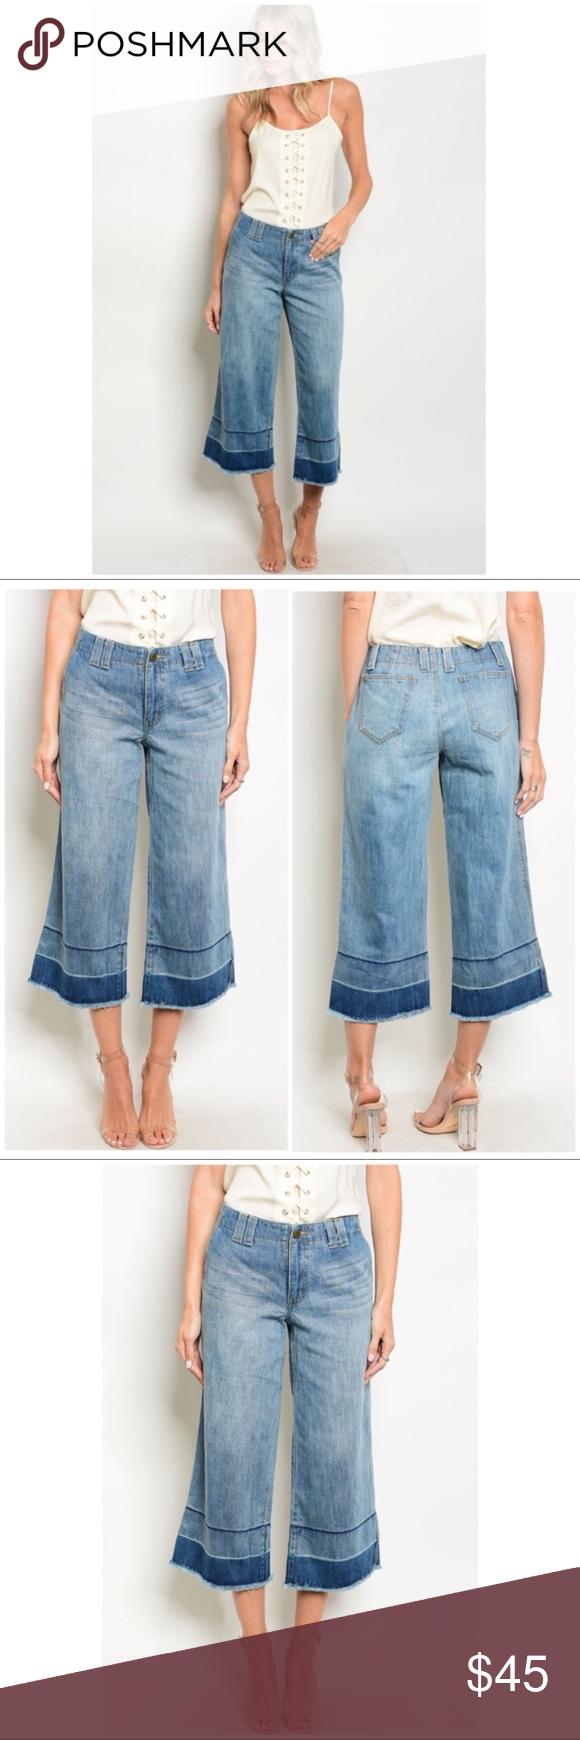 Blue Denim Distressed Wide Leg Capri Pants NWT Blue denim wide leg distressed je…